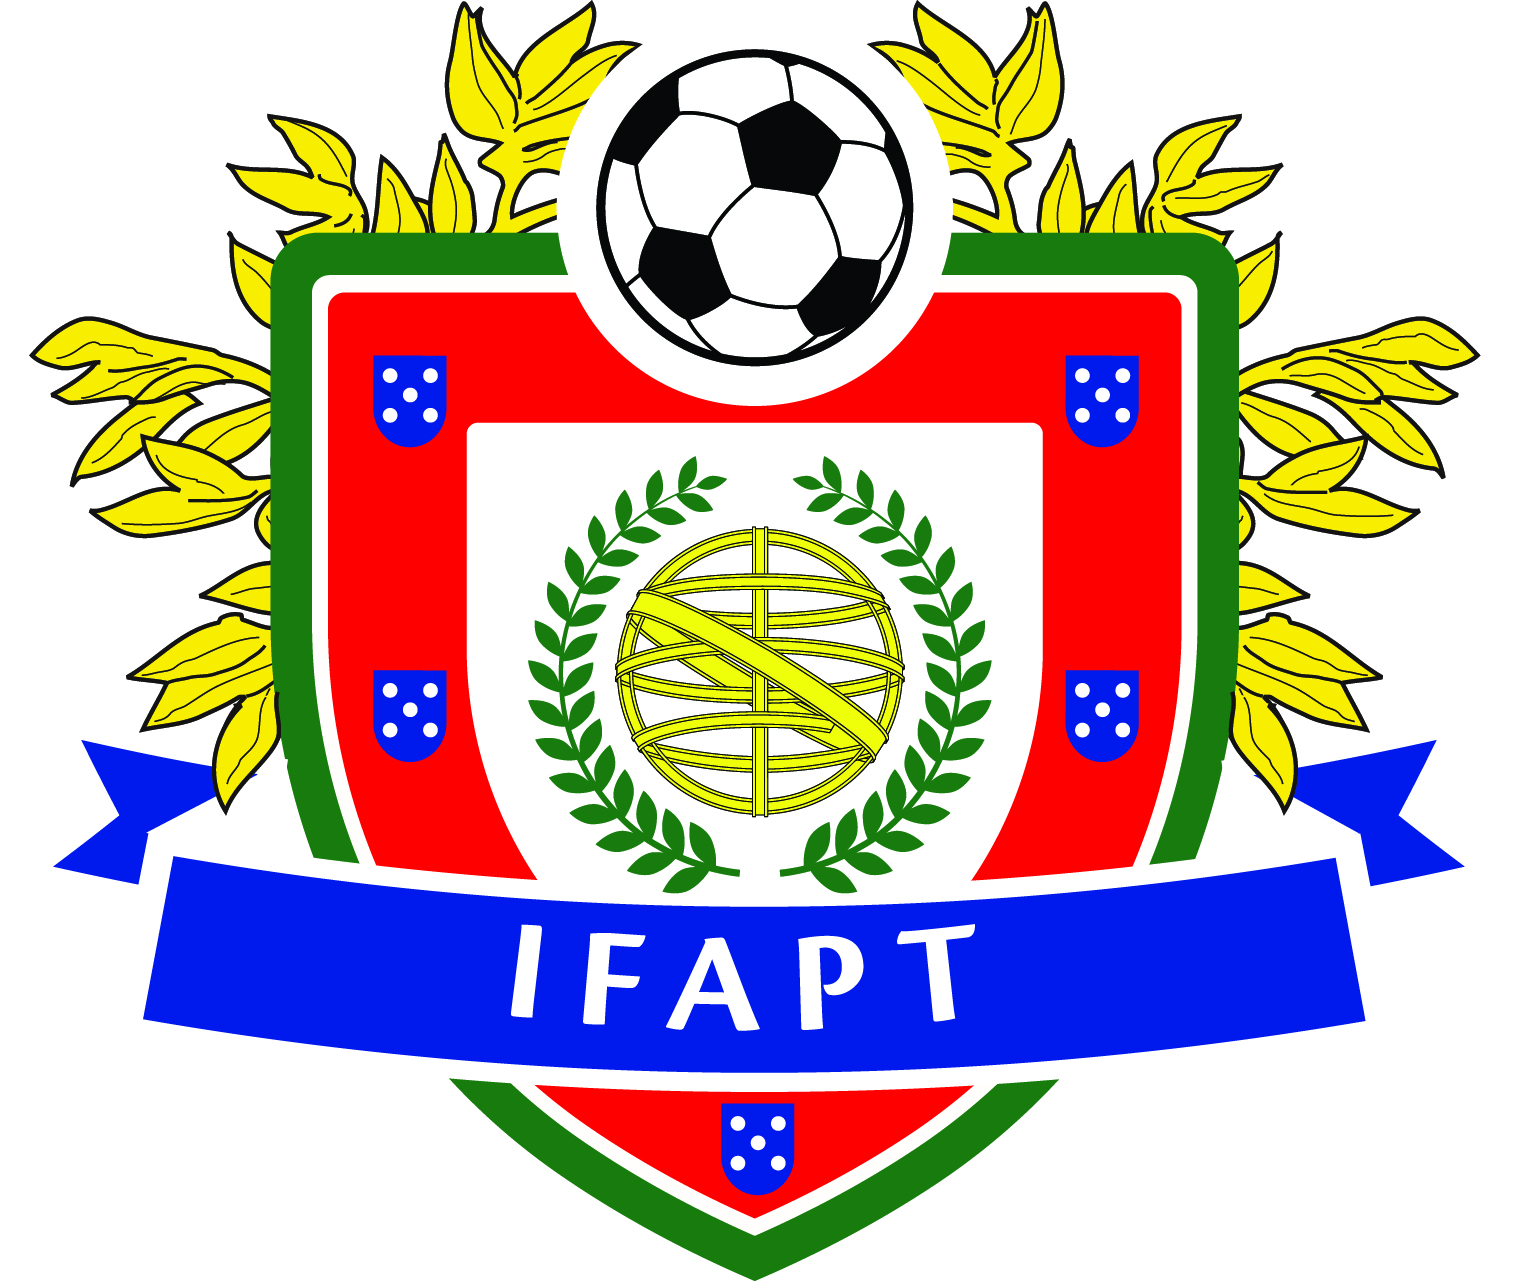 upUgo Soccer